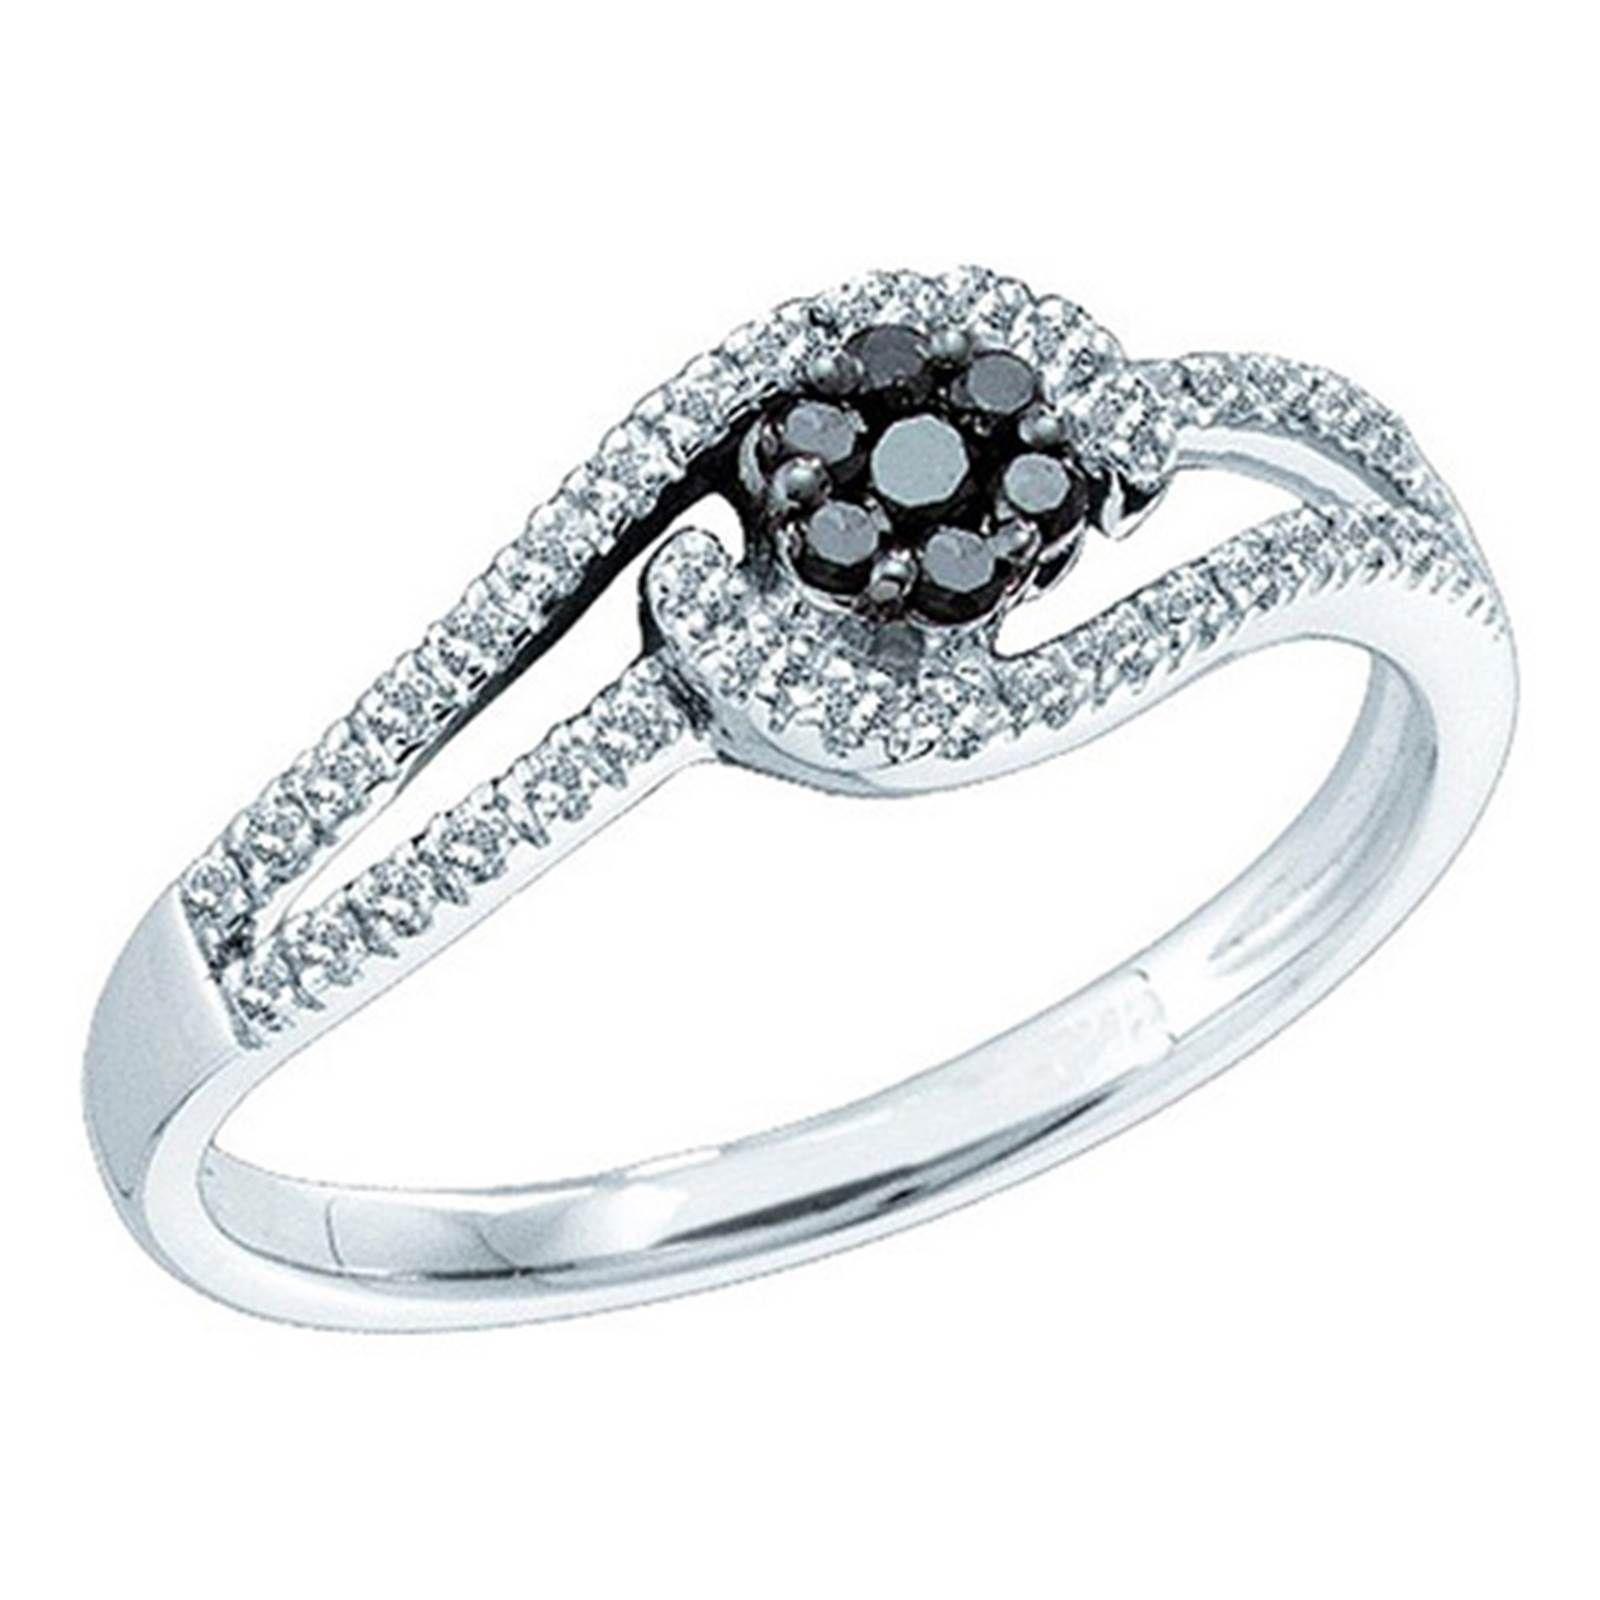 Ladies white gold black and white diamond anniversary flower ring